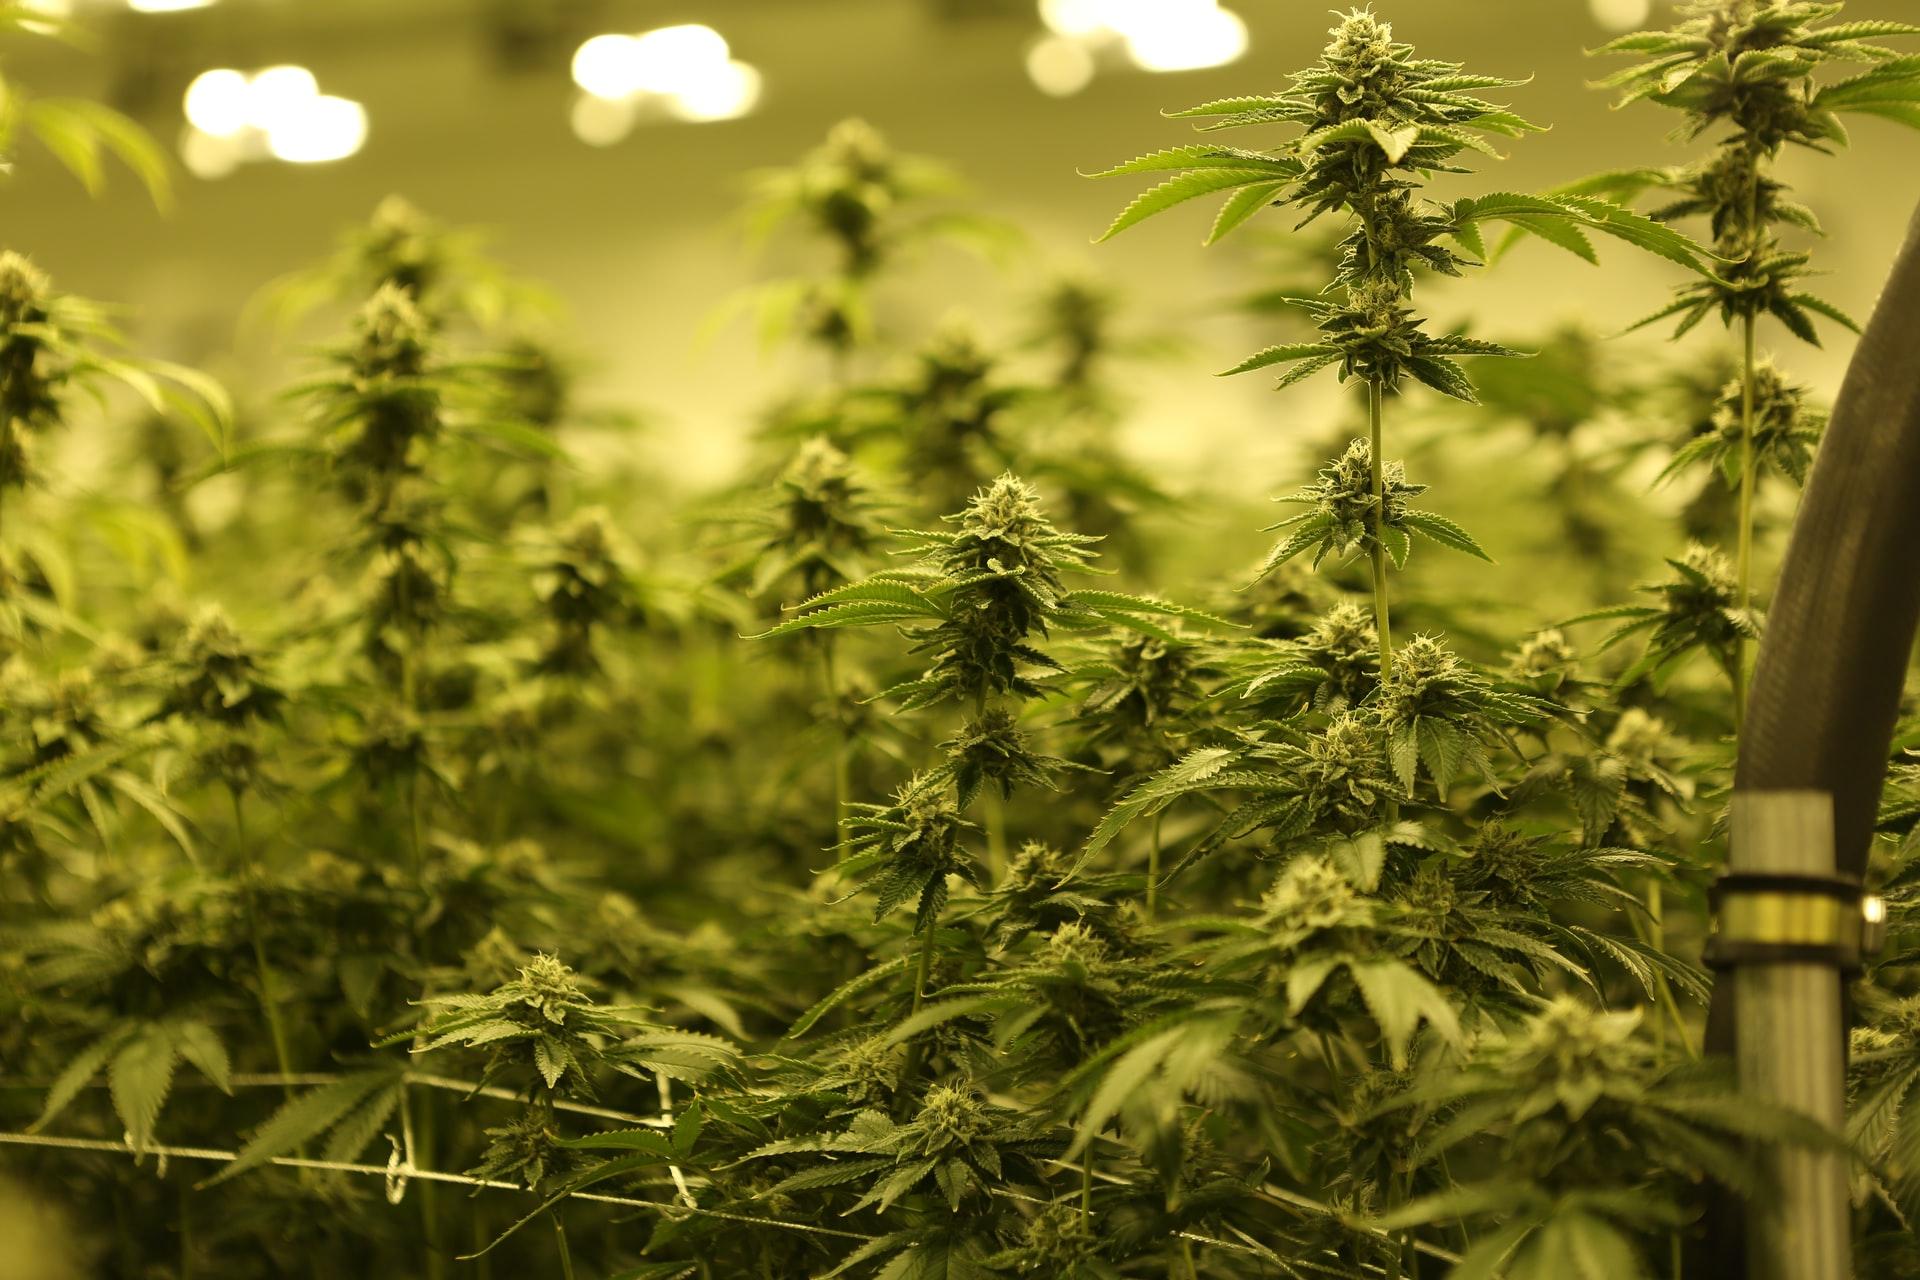 cannabis growing under yellow light